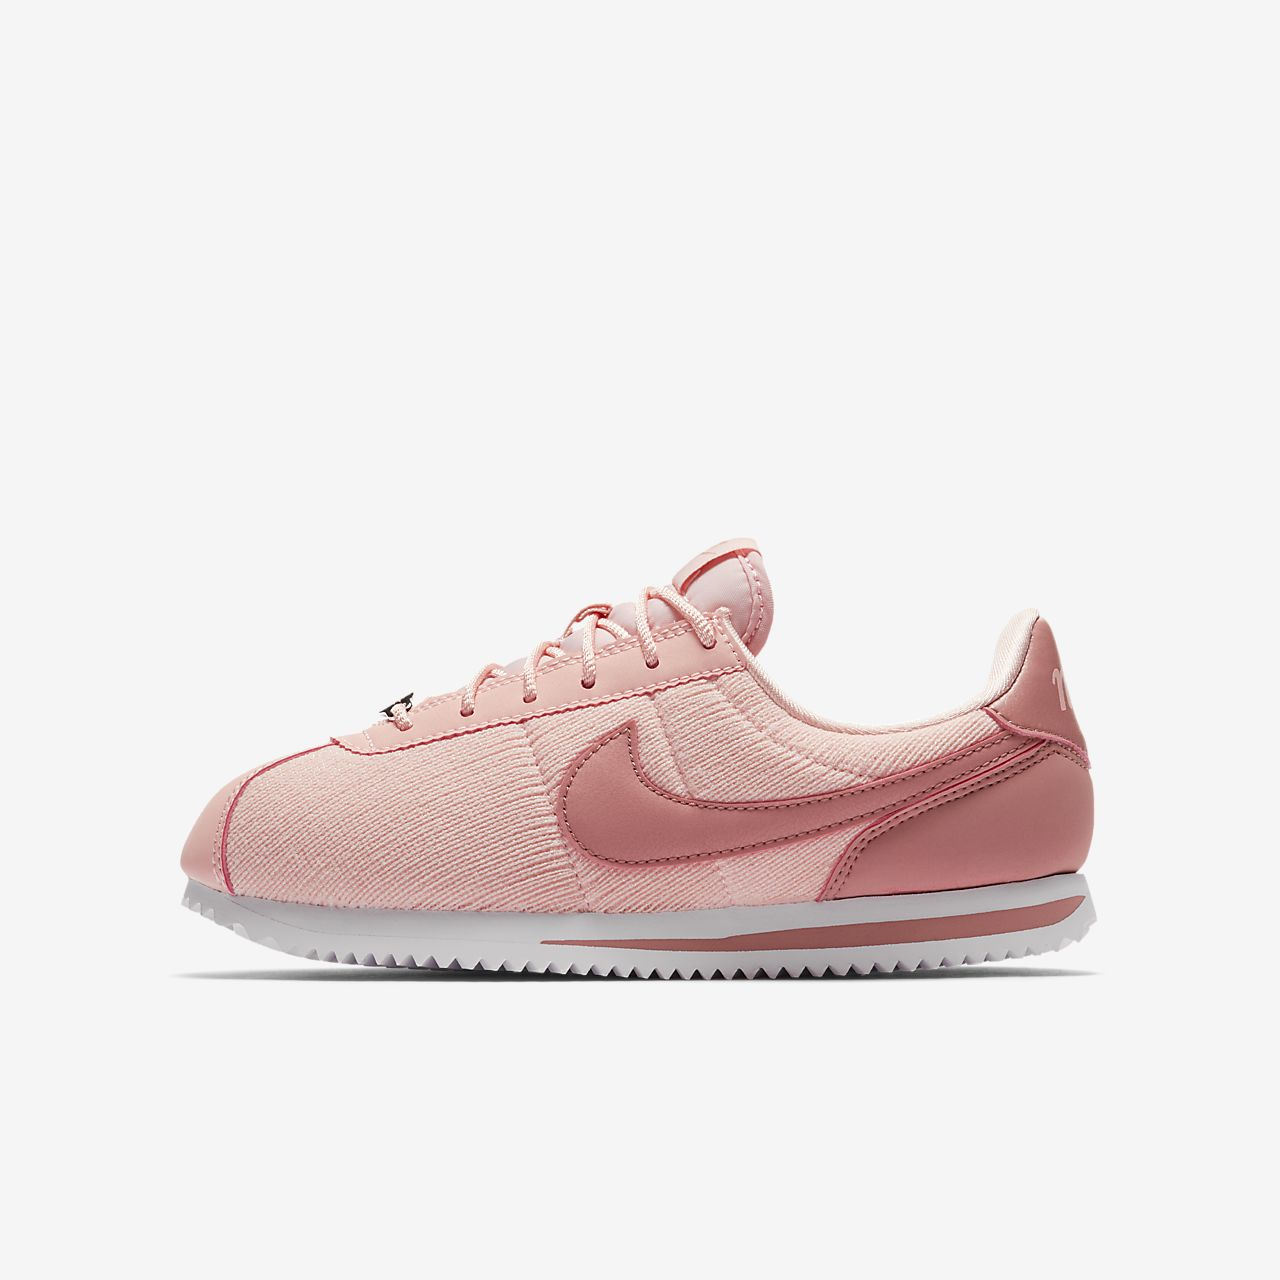 pretty nice c39c8 5a24d ... Nike Cortez Basic Text SE sko til store barn